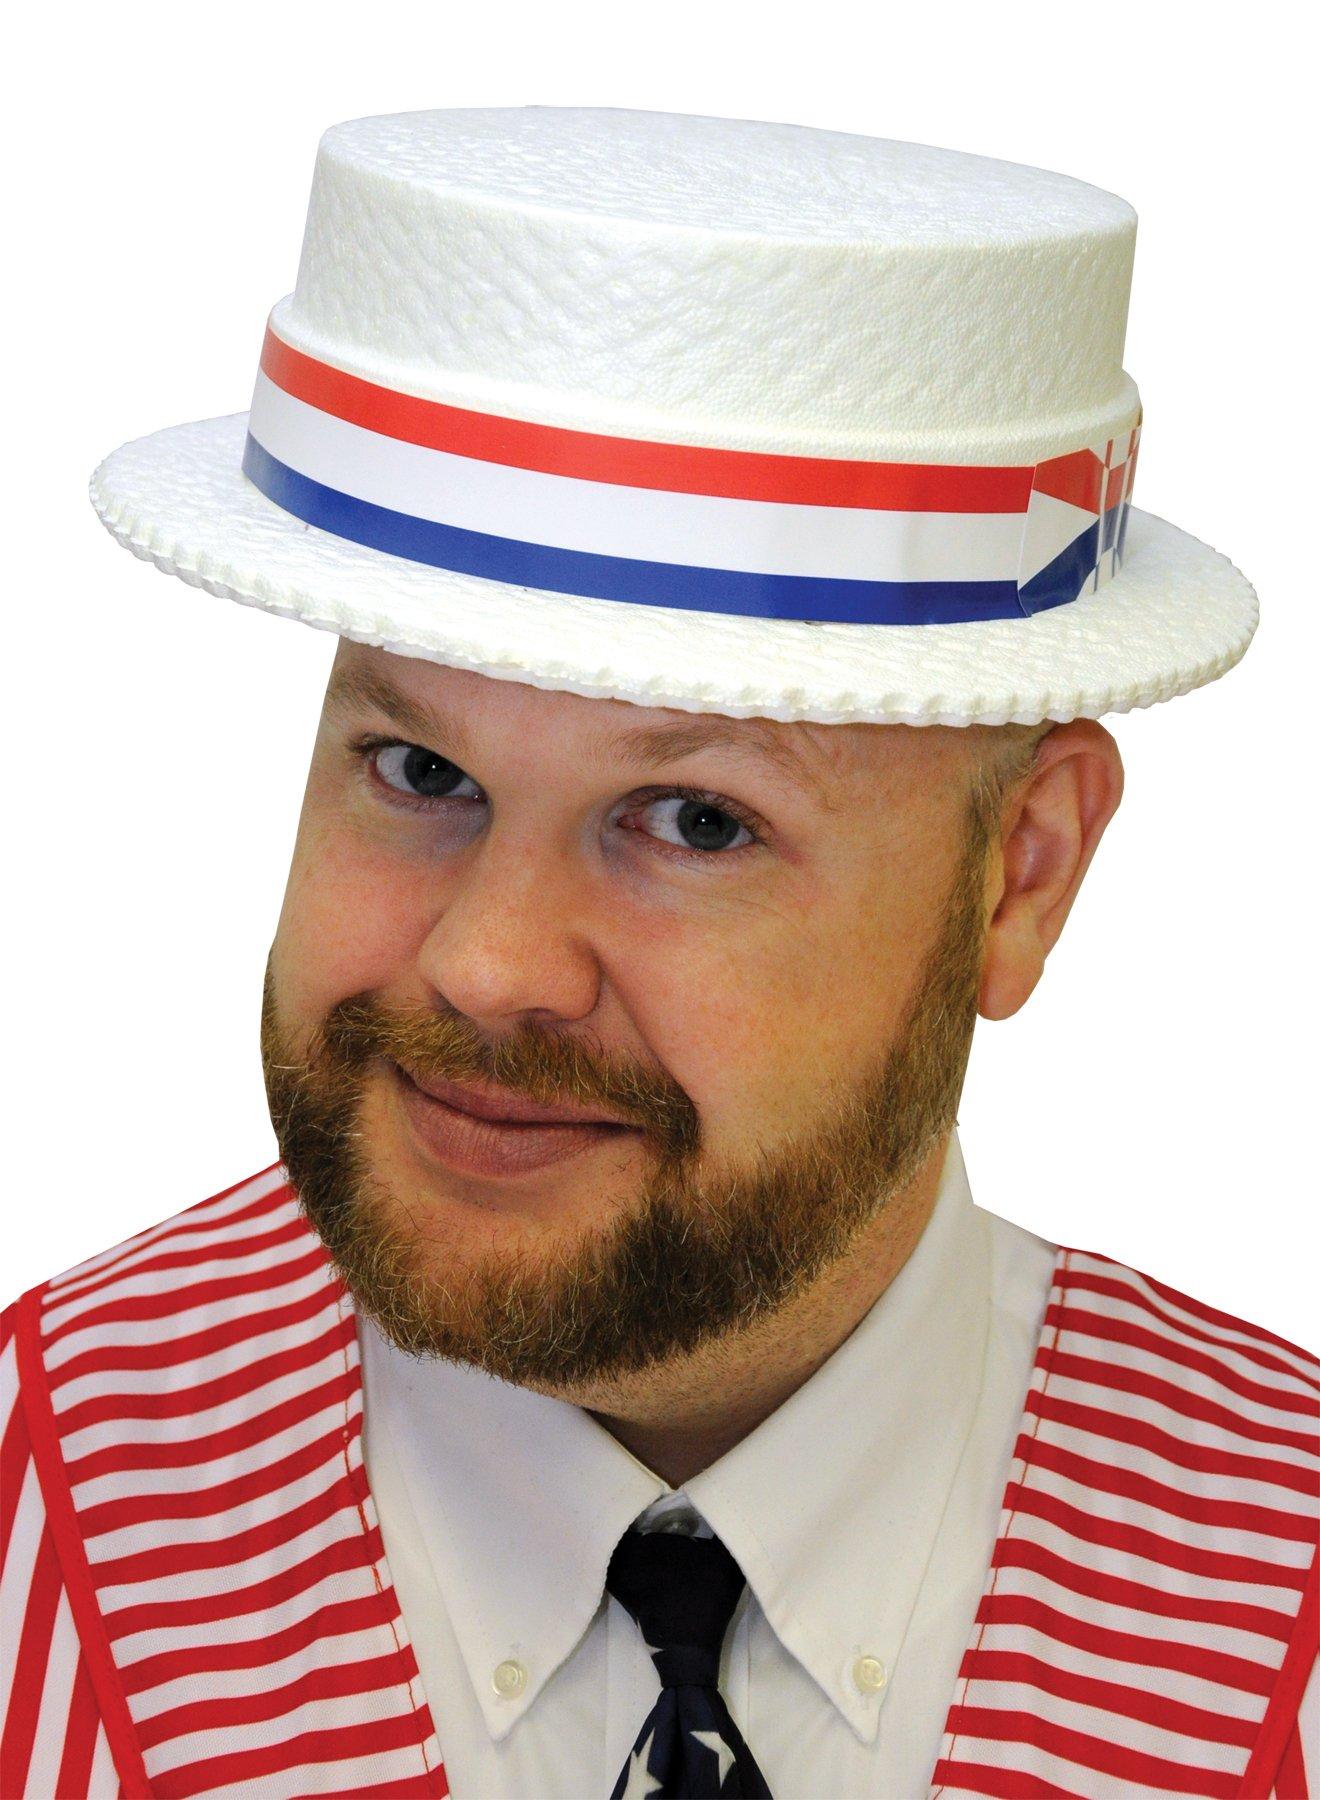 Skimmer Styrofoam Hat - 24 Hats in a Box by WonderCostumes (Image #3)